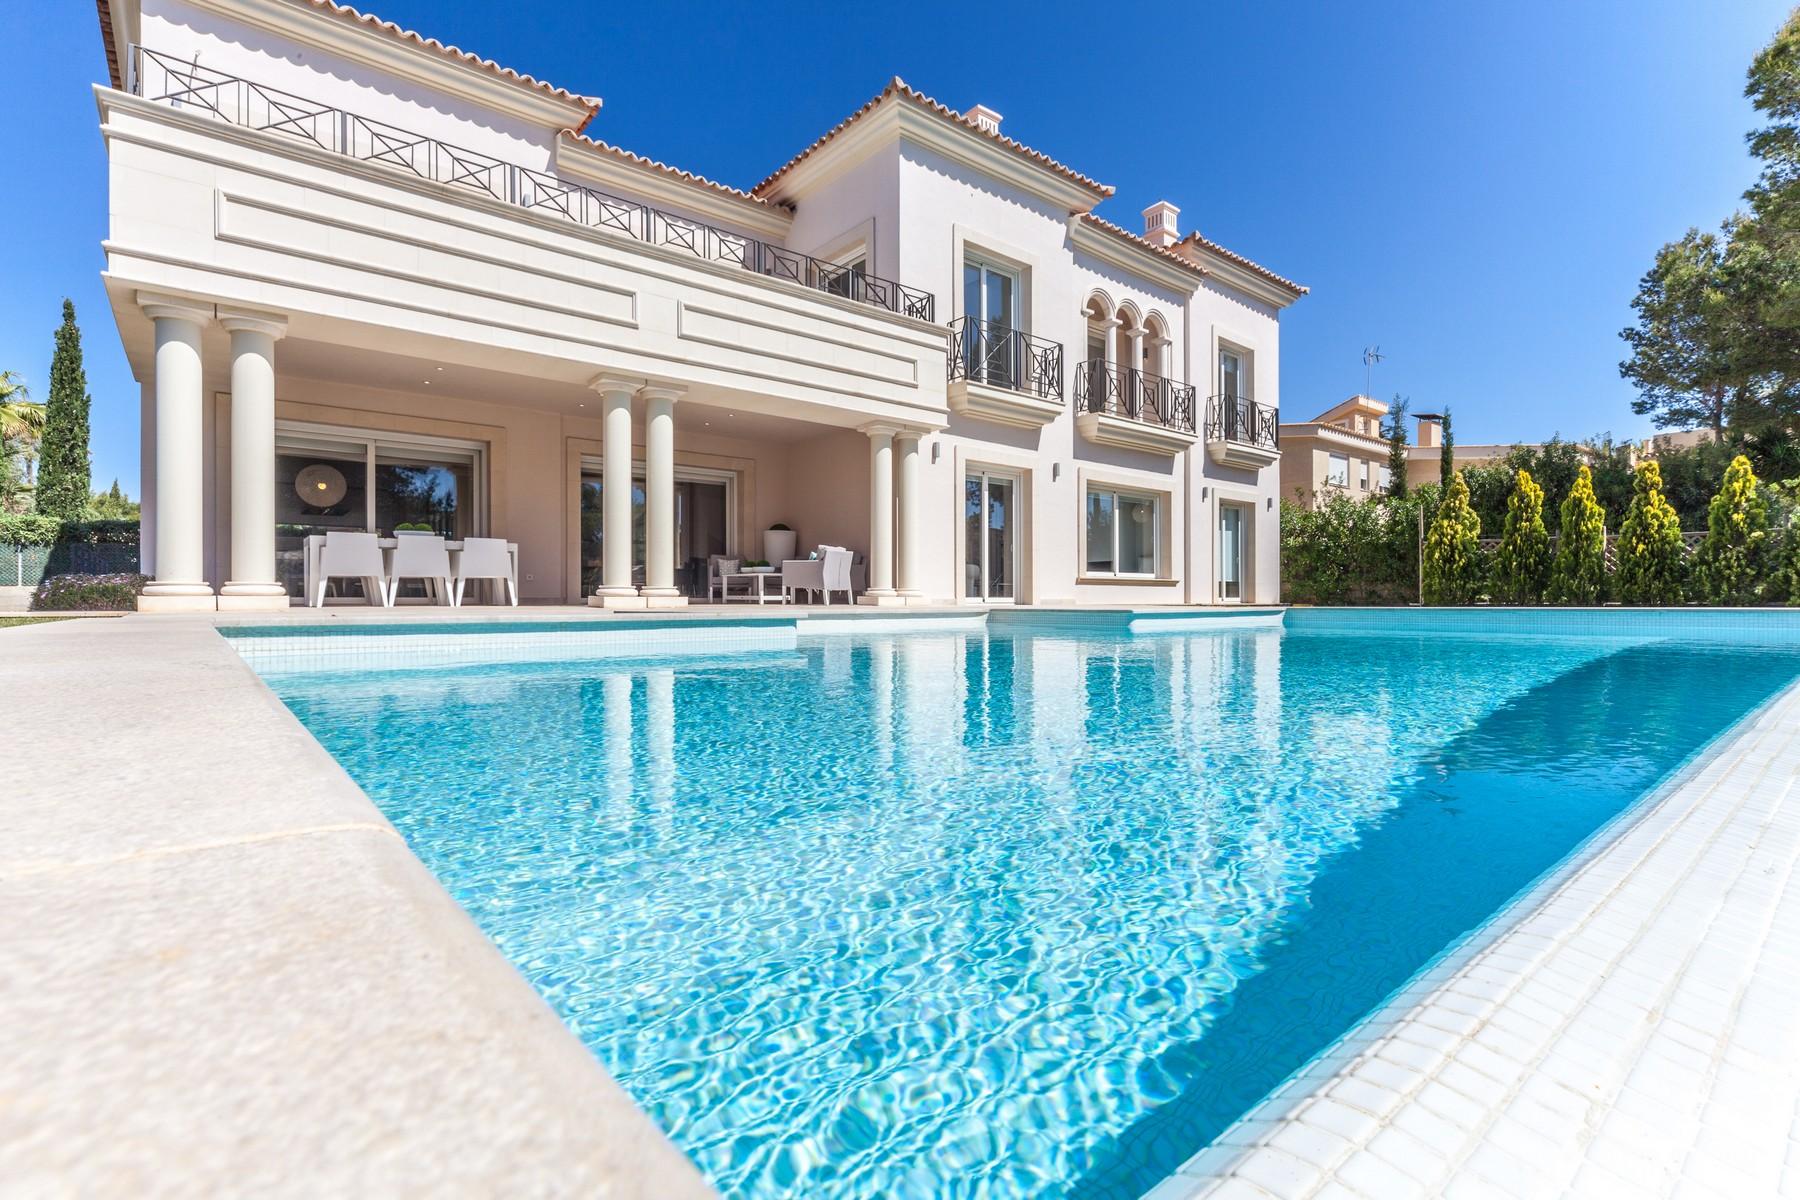 Single Family Home for Sale at Newly built villa in Nova Santa Ponsa Santa Ponsa, Mallorca 07181 Spain